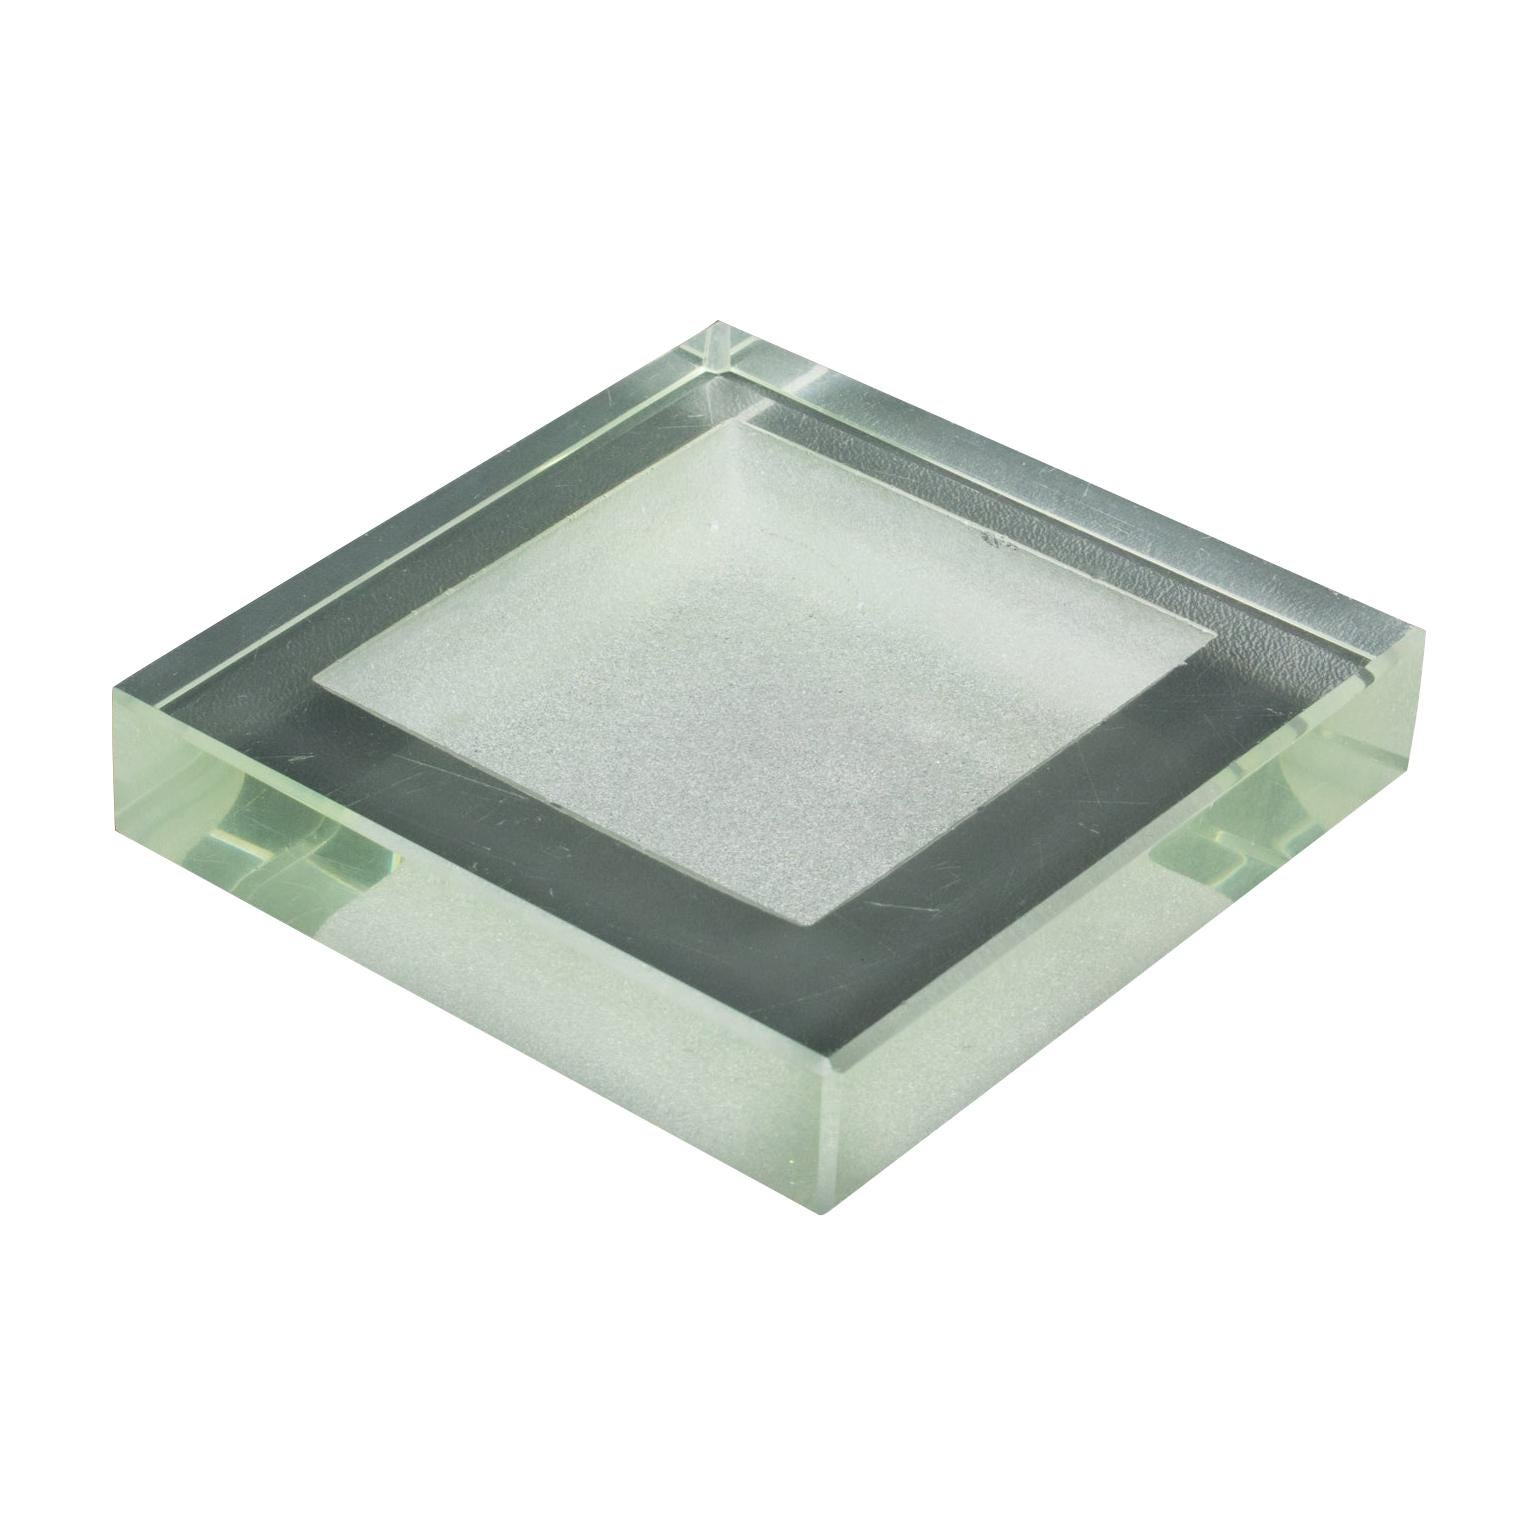 Jean Luce Art Deco Glass Ashtray Desk Tidy Catchall